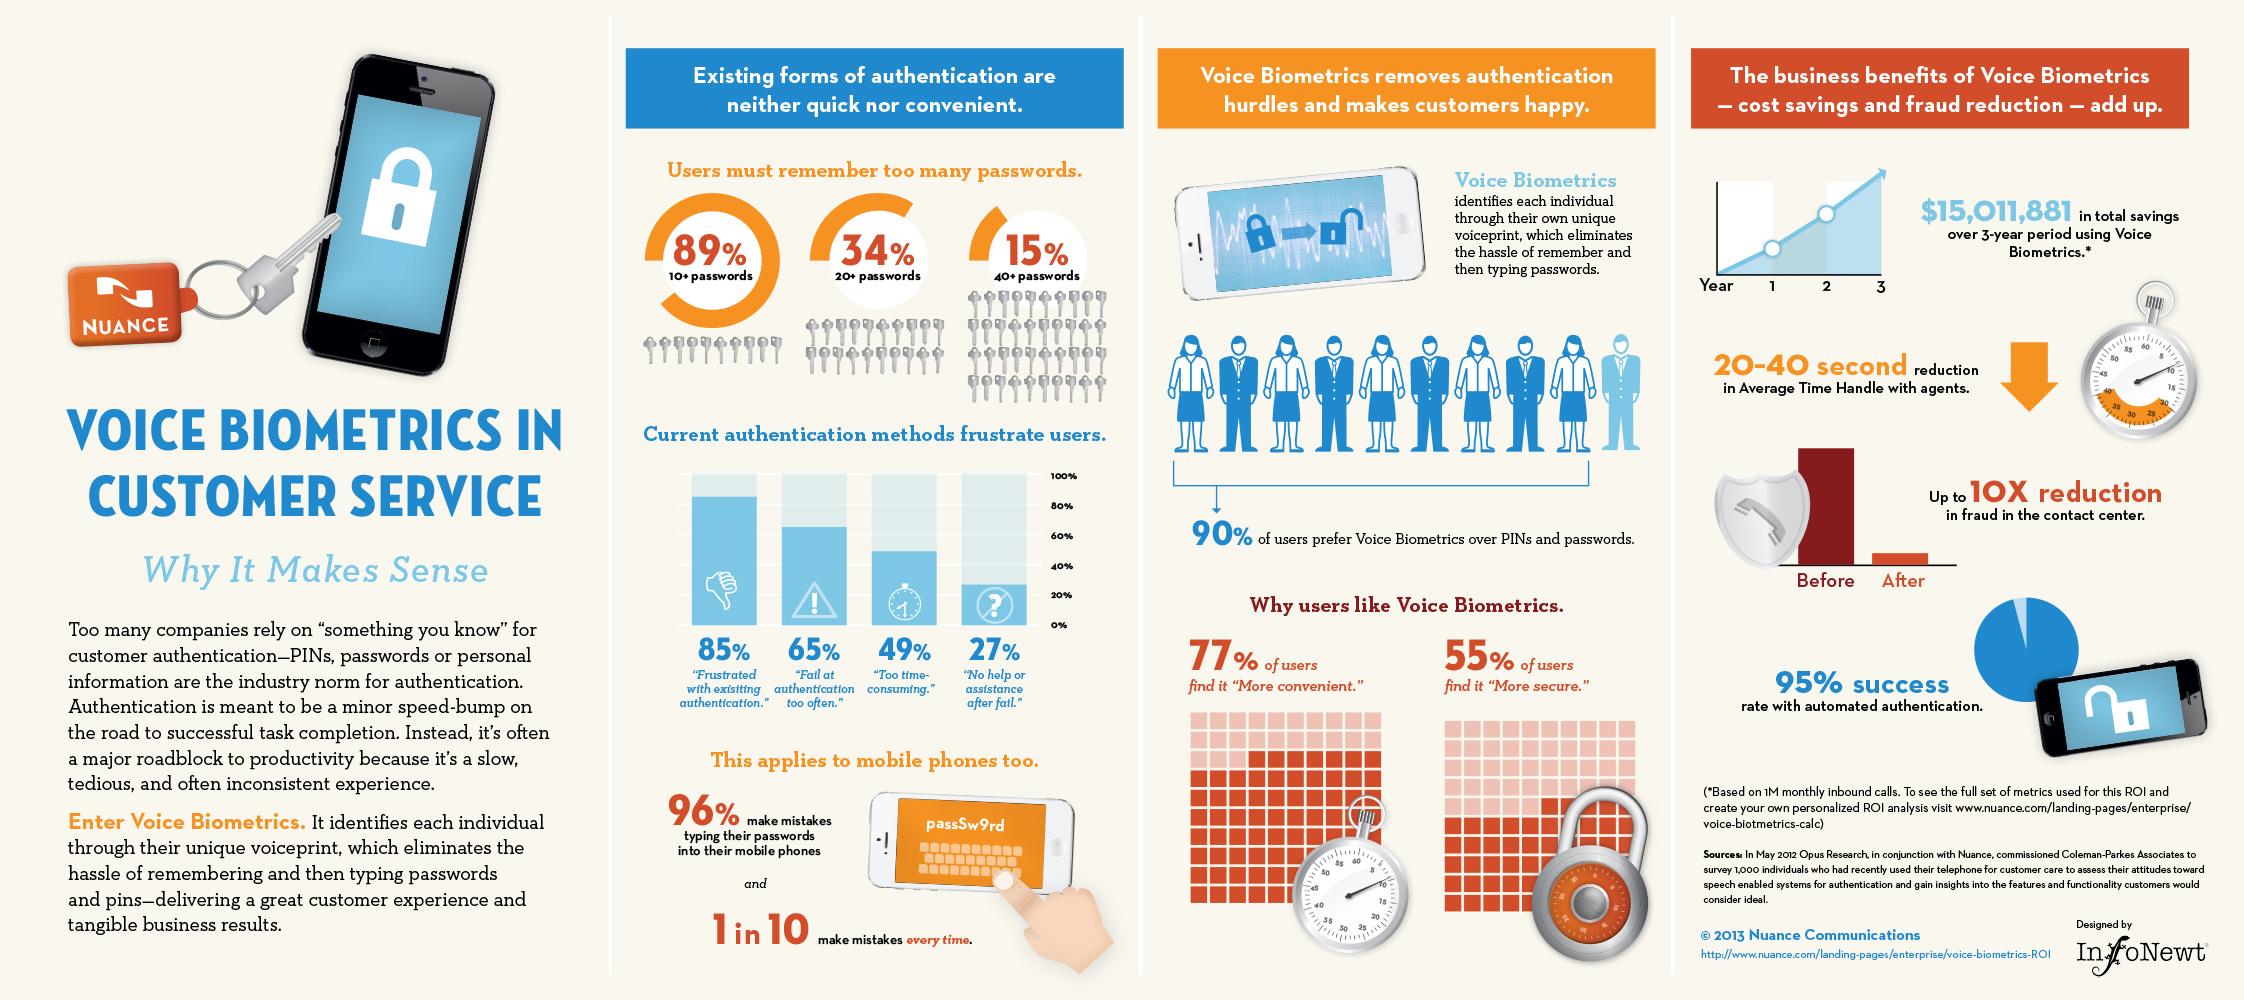 Voice Biometrics in Customer Service